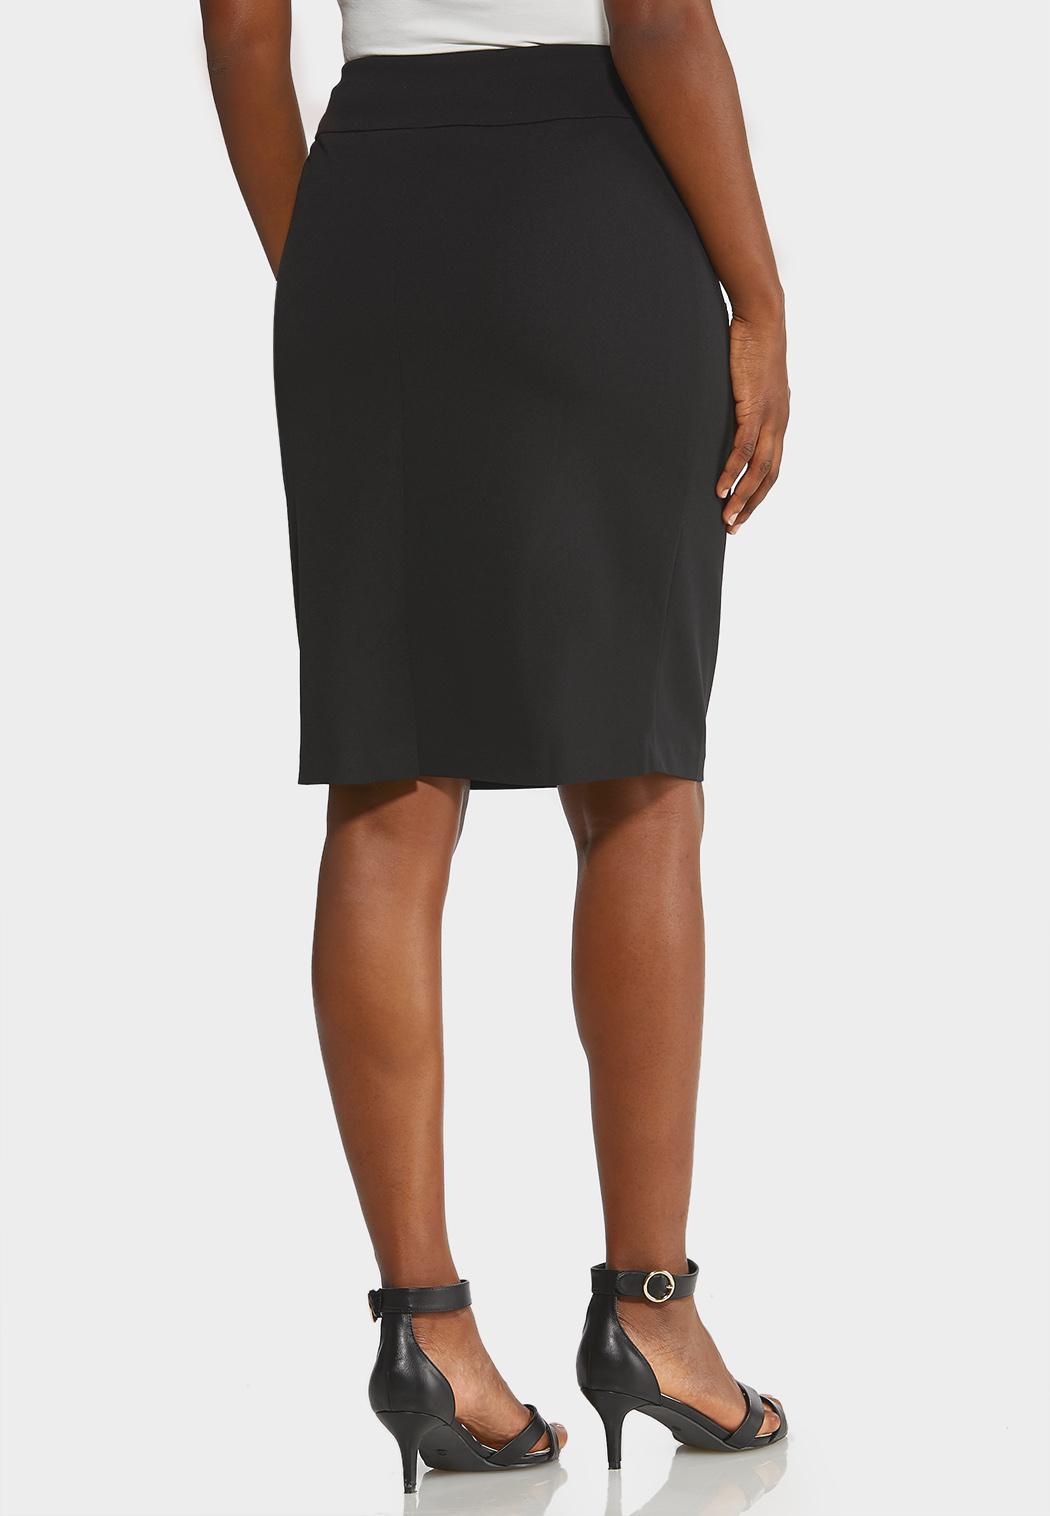 Knit Pencil Skirt (Item #43893028)